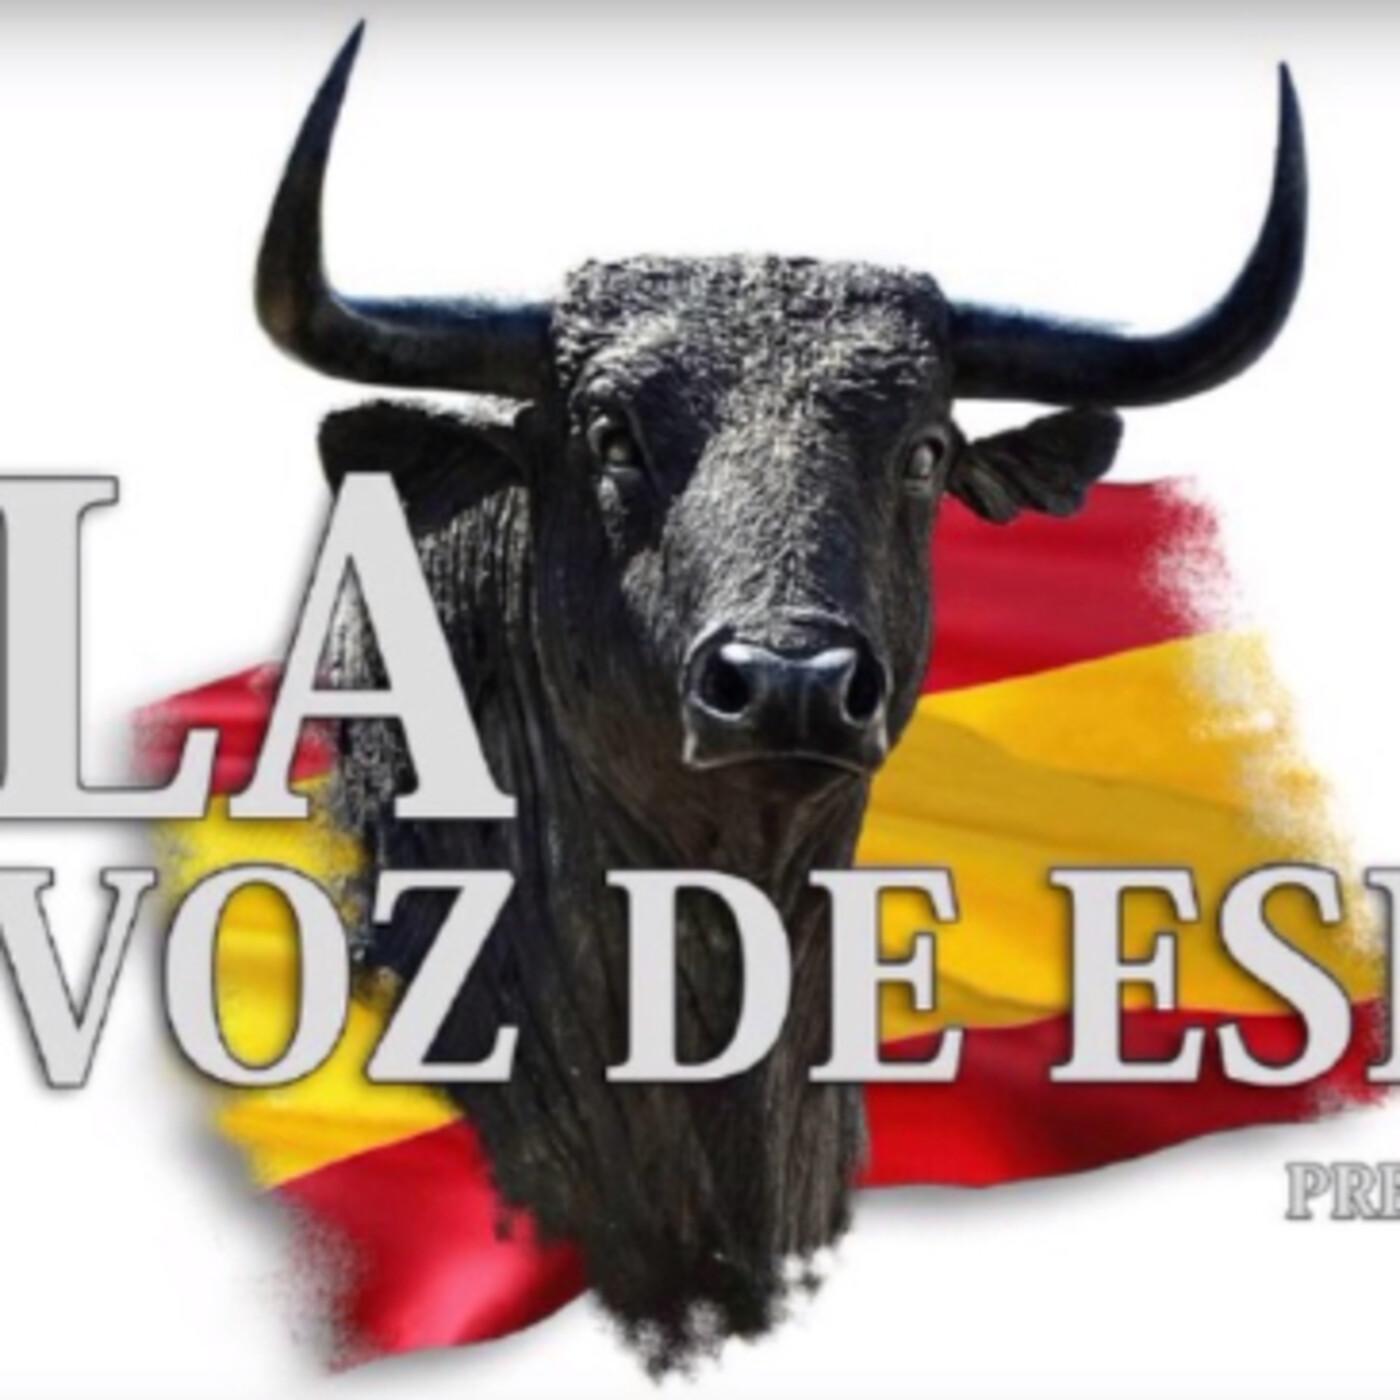 LA VOZ DE ESPAÑA Ed: 230 (17 de Mayo)